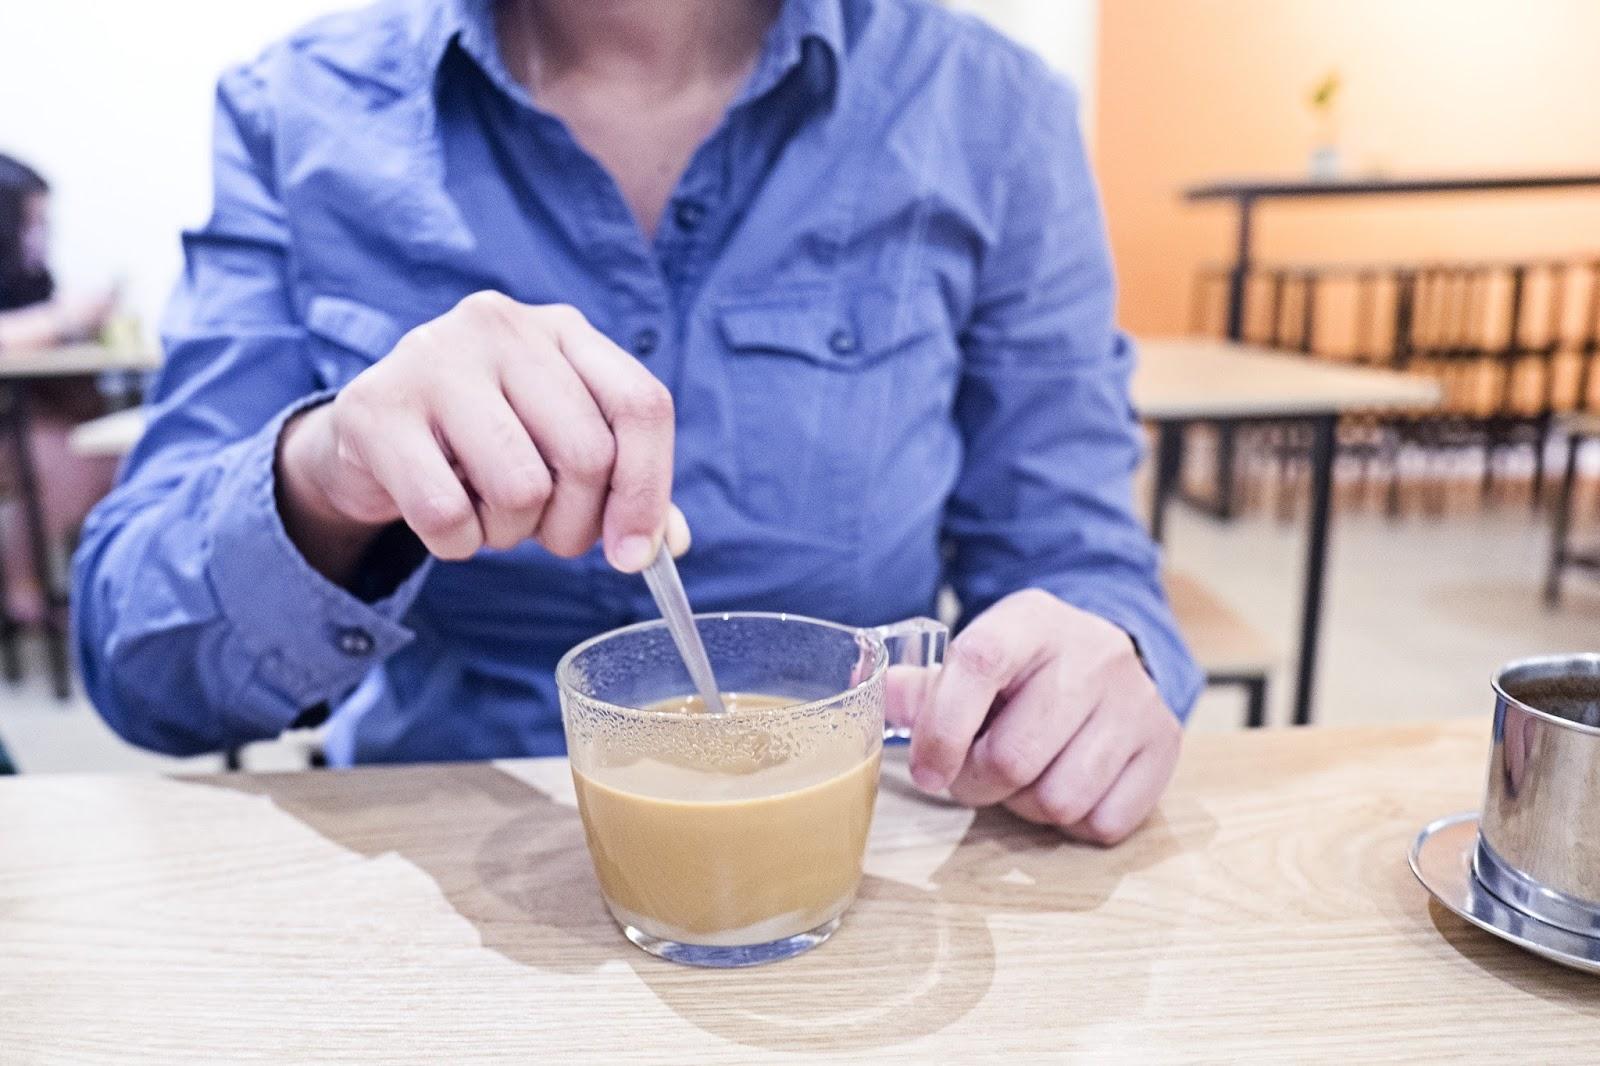 d-coffee-L1070169.jpg